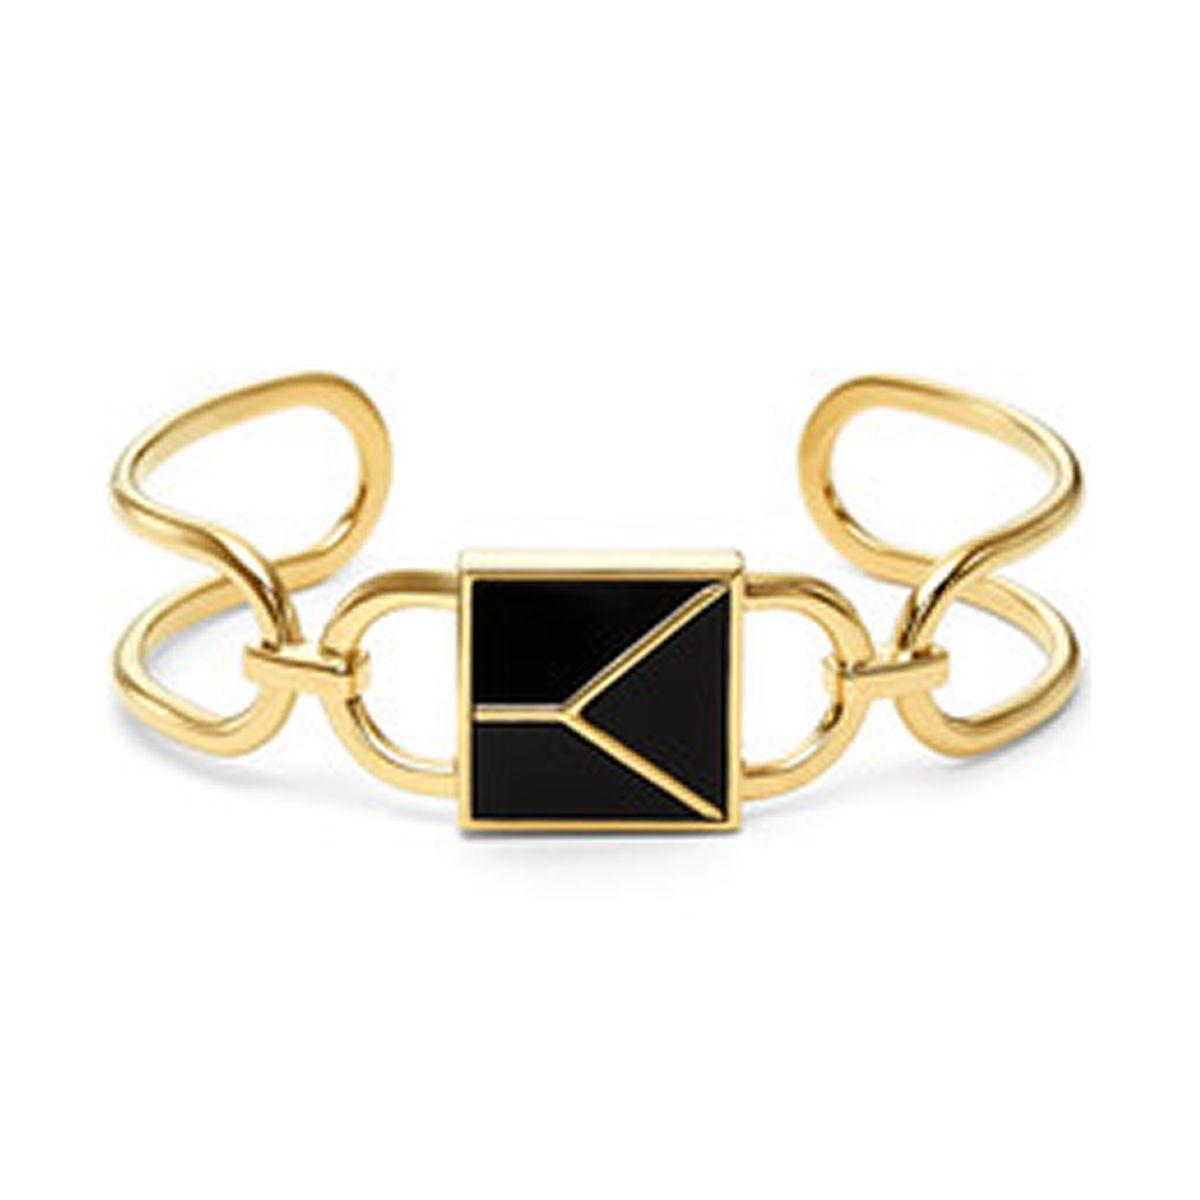 Michael Kors Jewelry - Macy s 8398269157